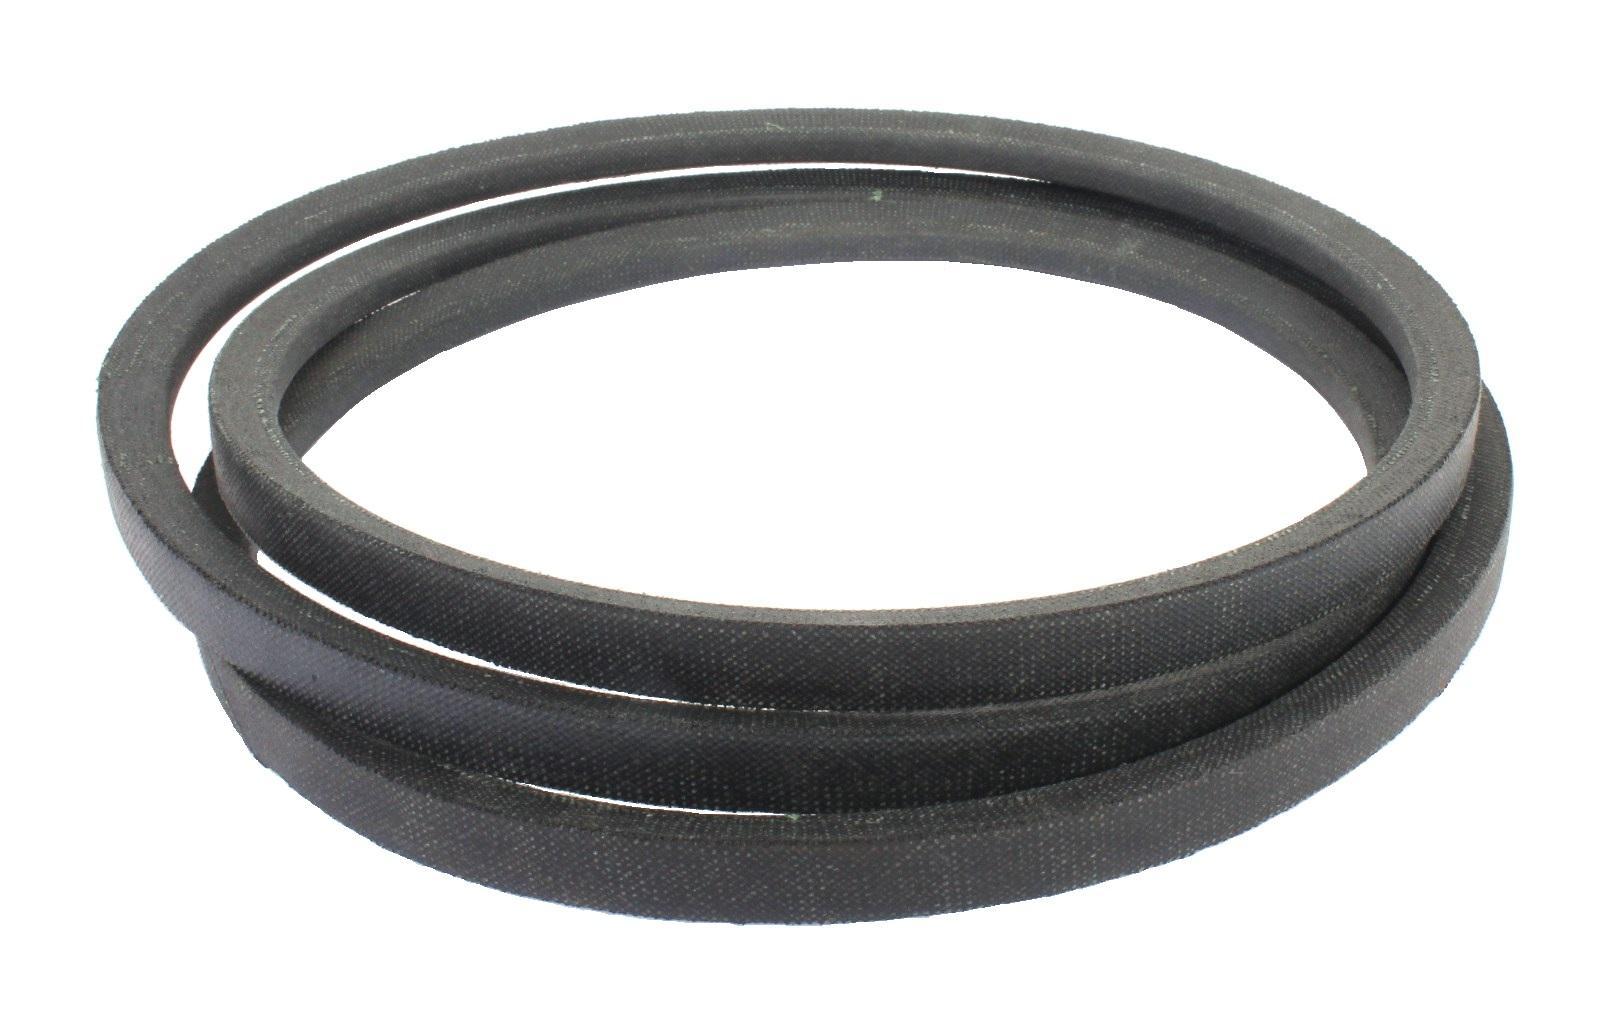 SPZ2000 SPZ Section Protorque Wedge V Belt 10x8x2000mm Free UK Postage